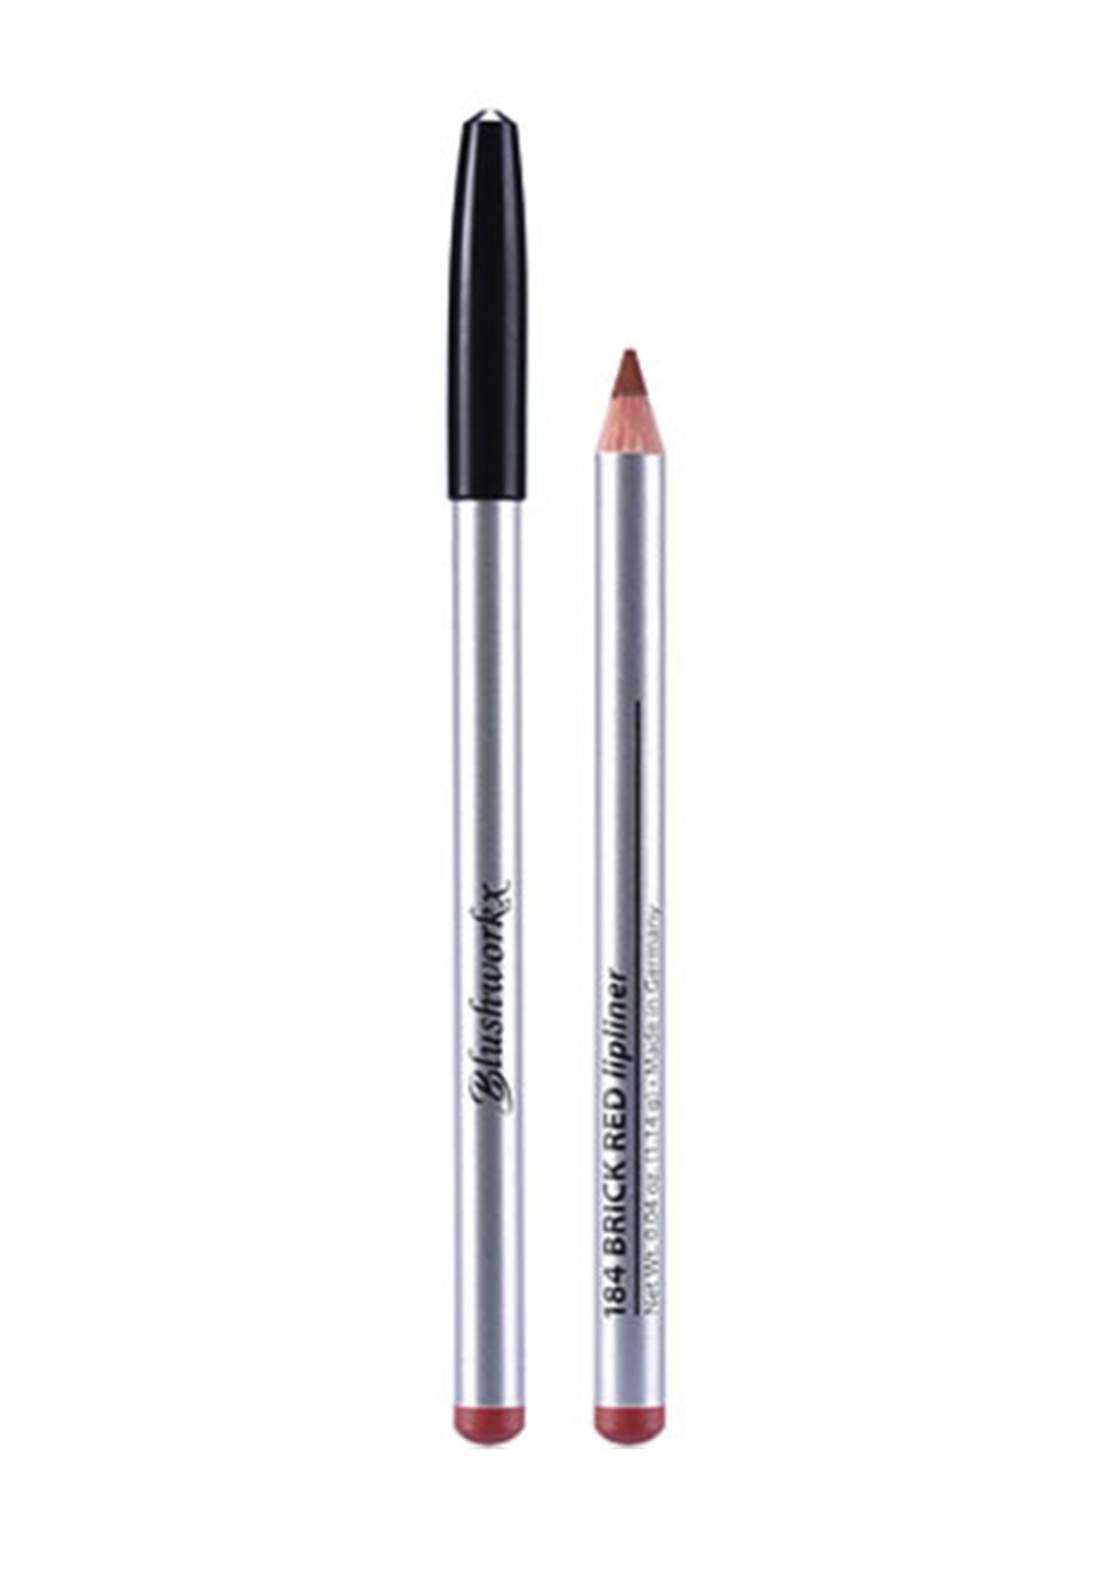 Blushworkx Hollywood Lip Liner Pencil No.183 Pink Mauve 1.14g محدد الشفاه